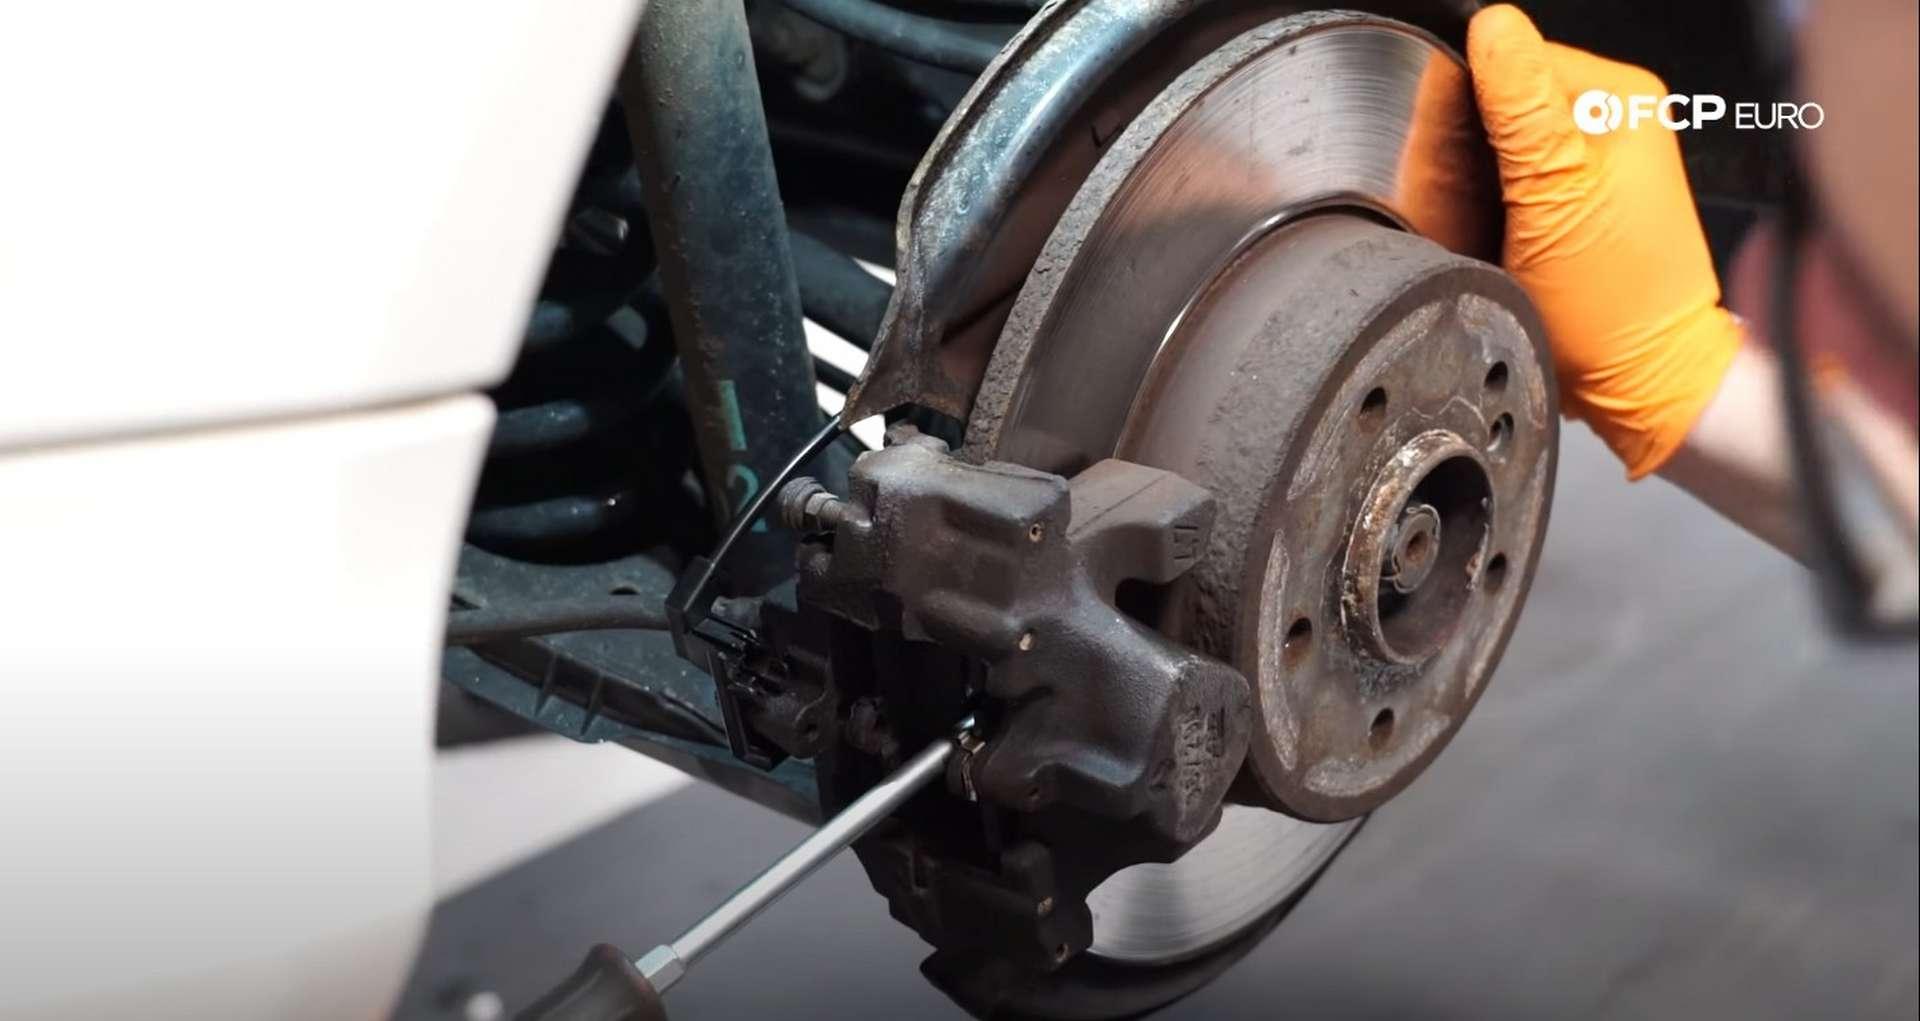 04-DIY-Mercedes-W203-Rear-Brake-Service_Removing-Caliper